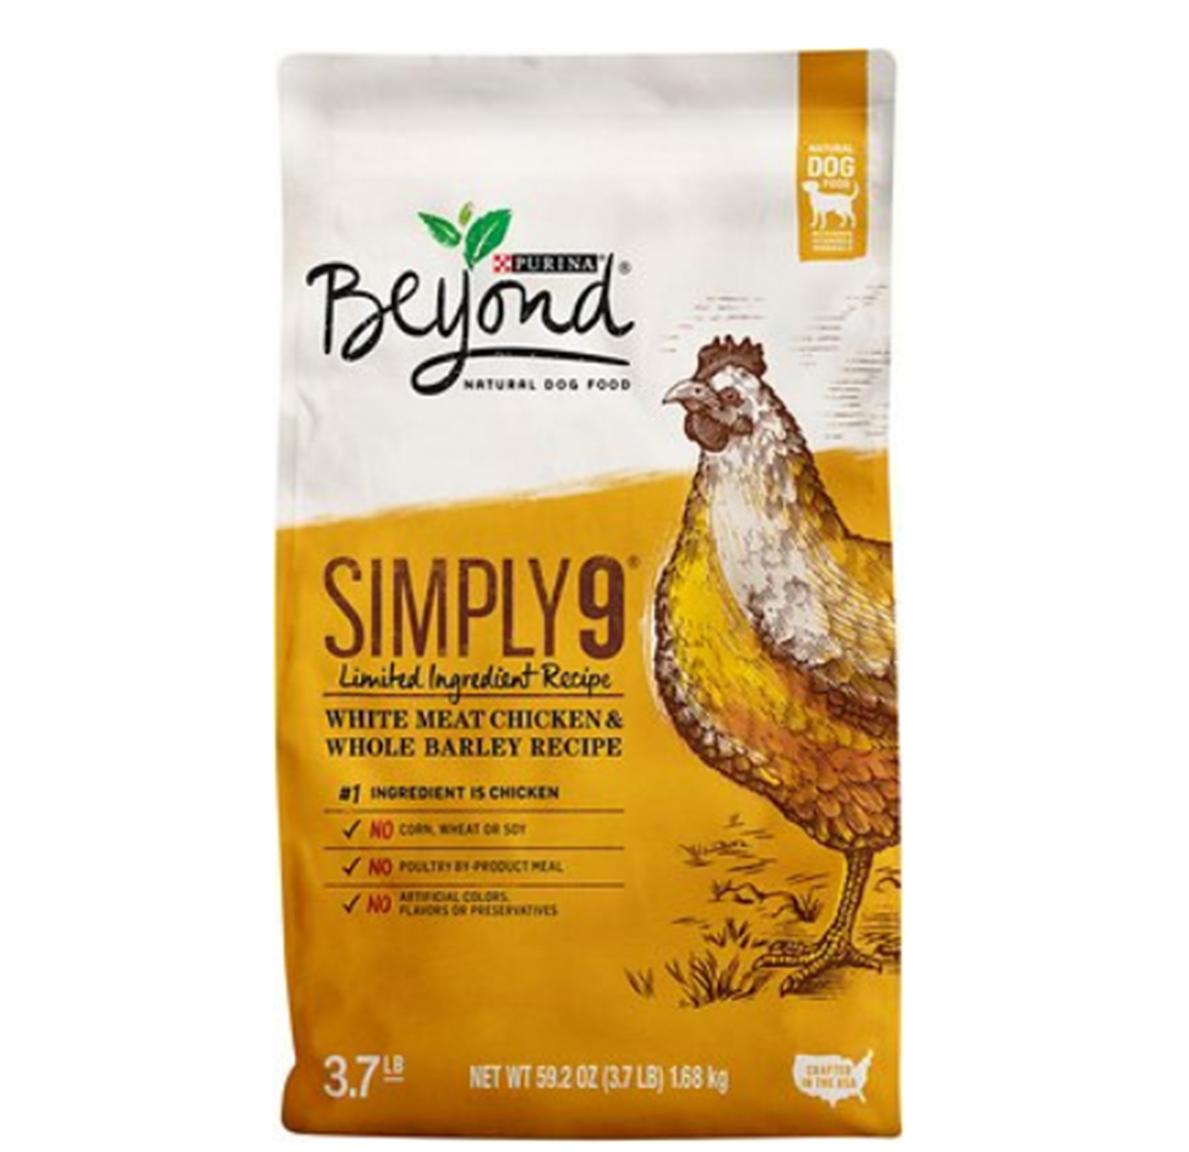 Publix – Beyond Dry Dog Food 3.7 lb bag Only 10¢ Each, Reg $8.19!